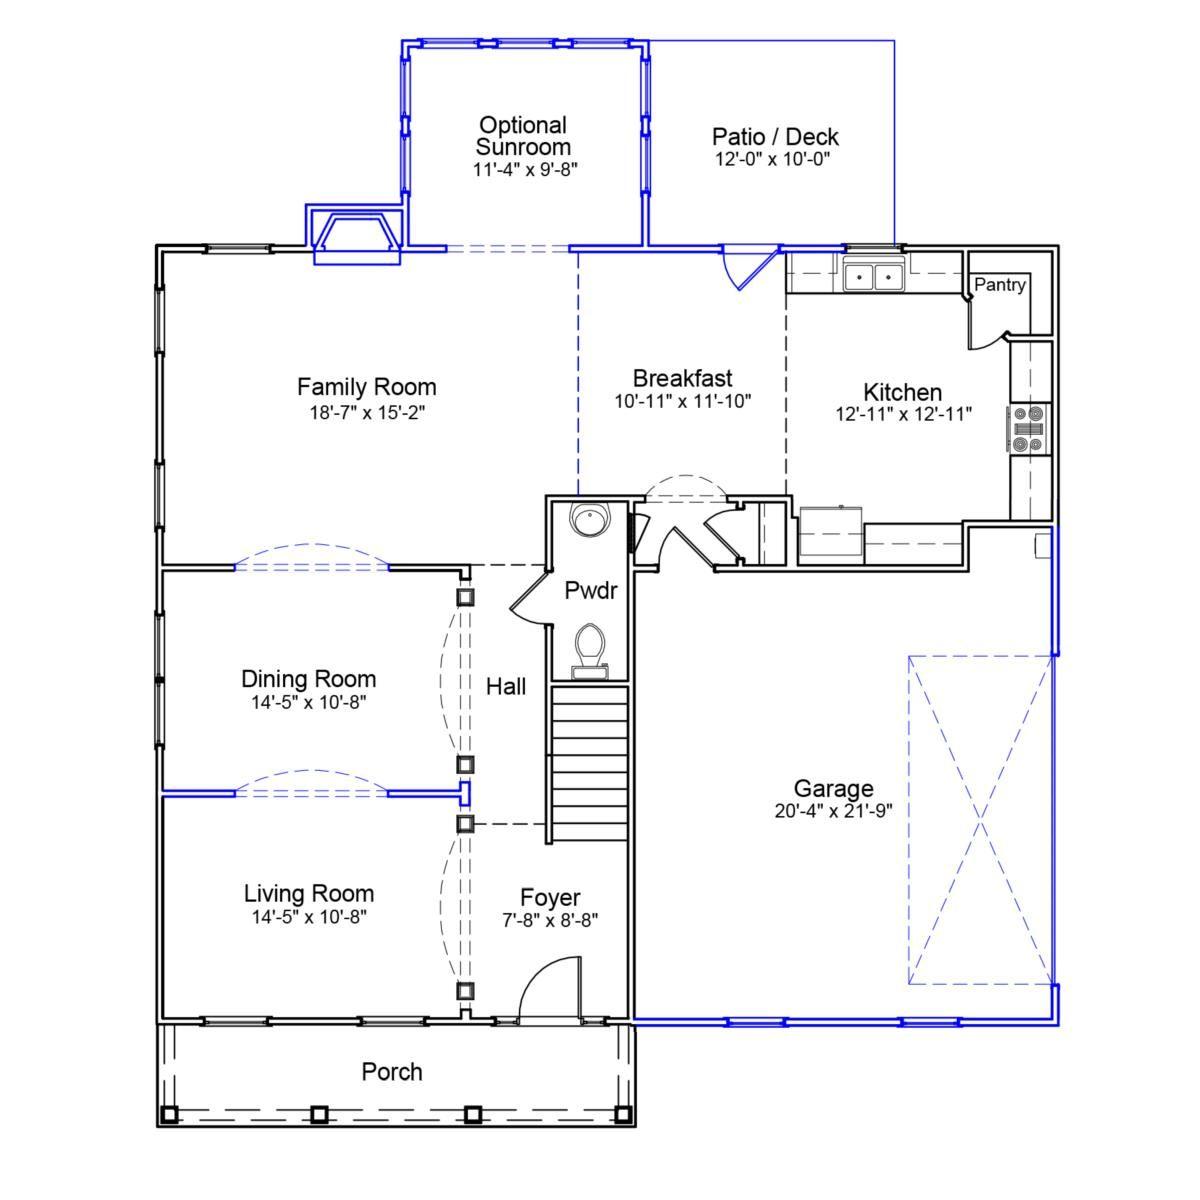 16++ Mungo homes floor plans image ideas